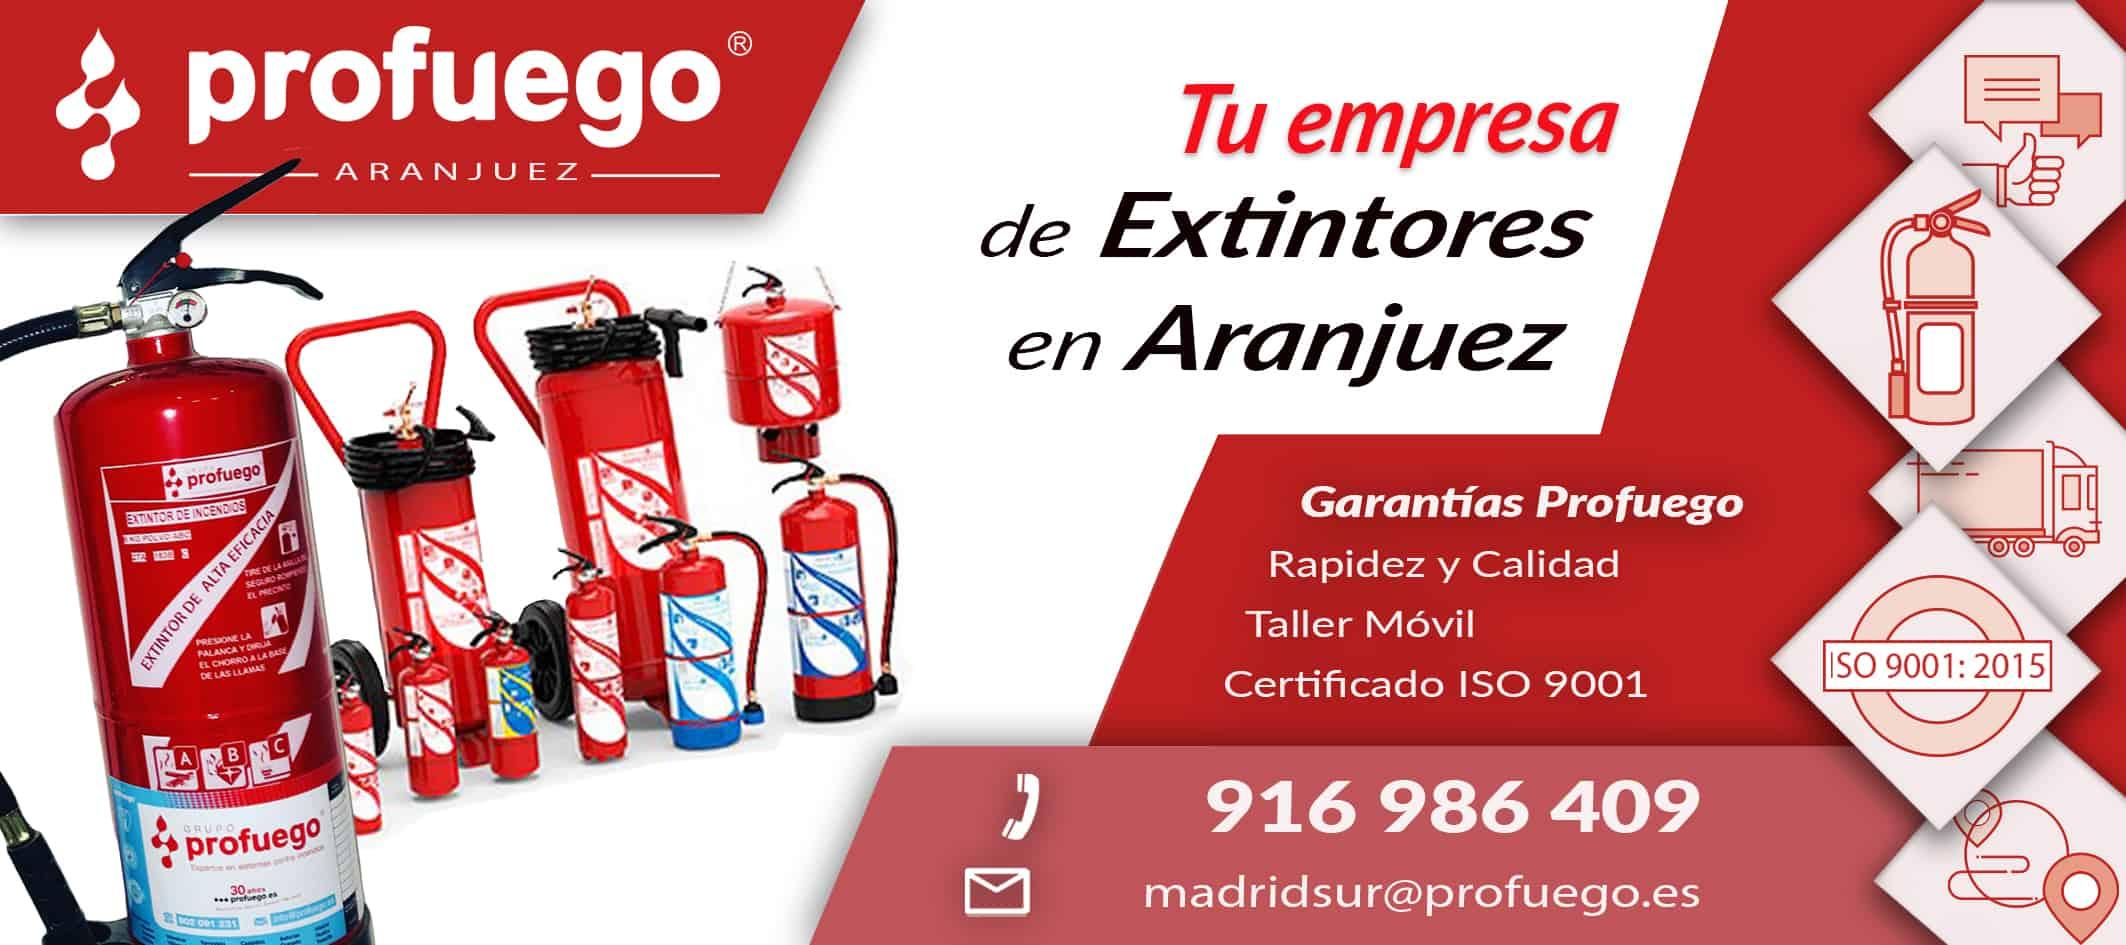 extintores aranjuez